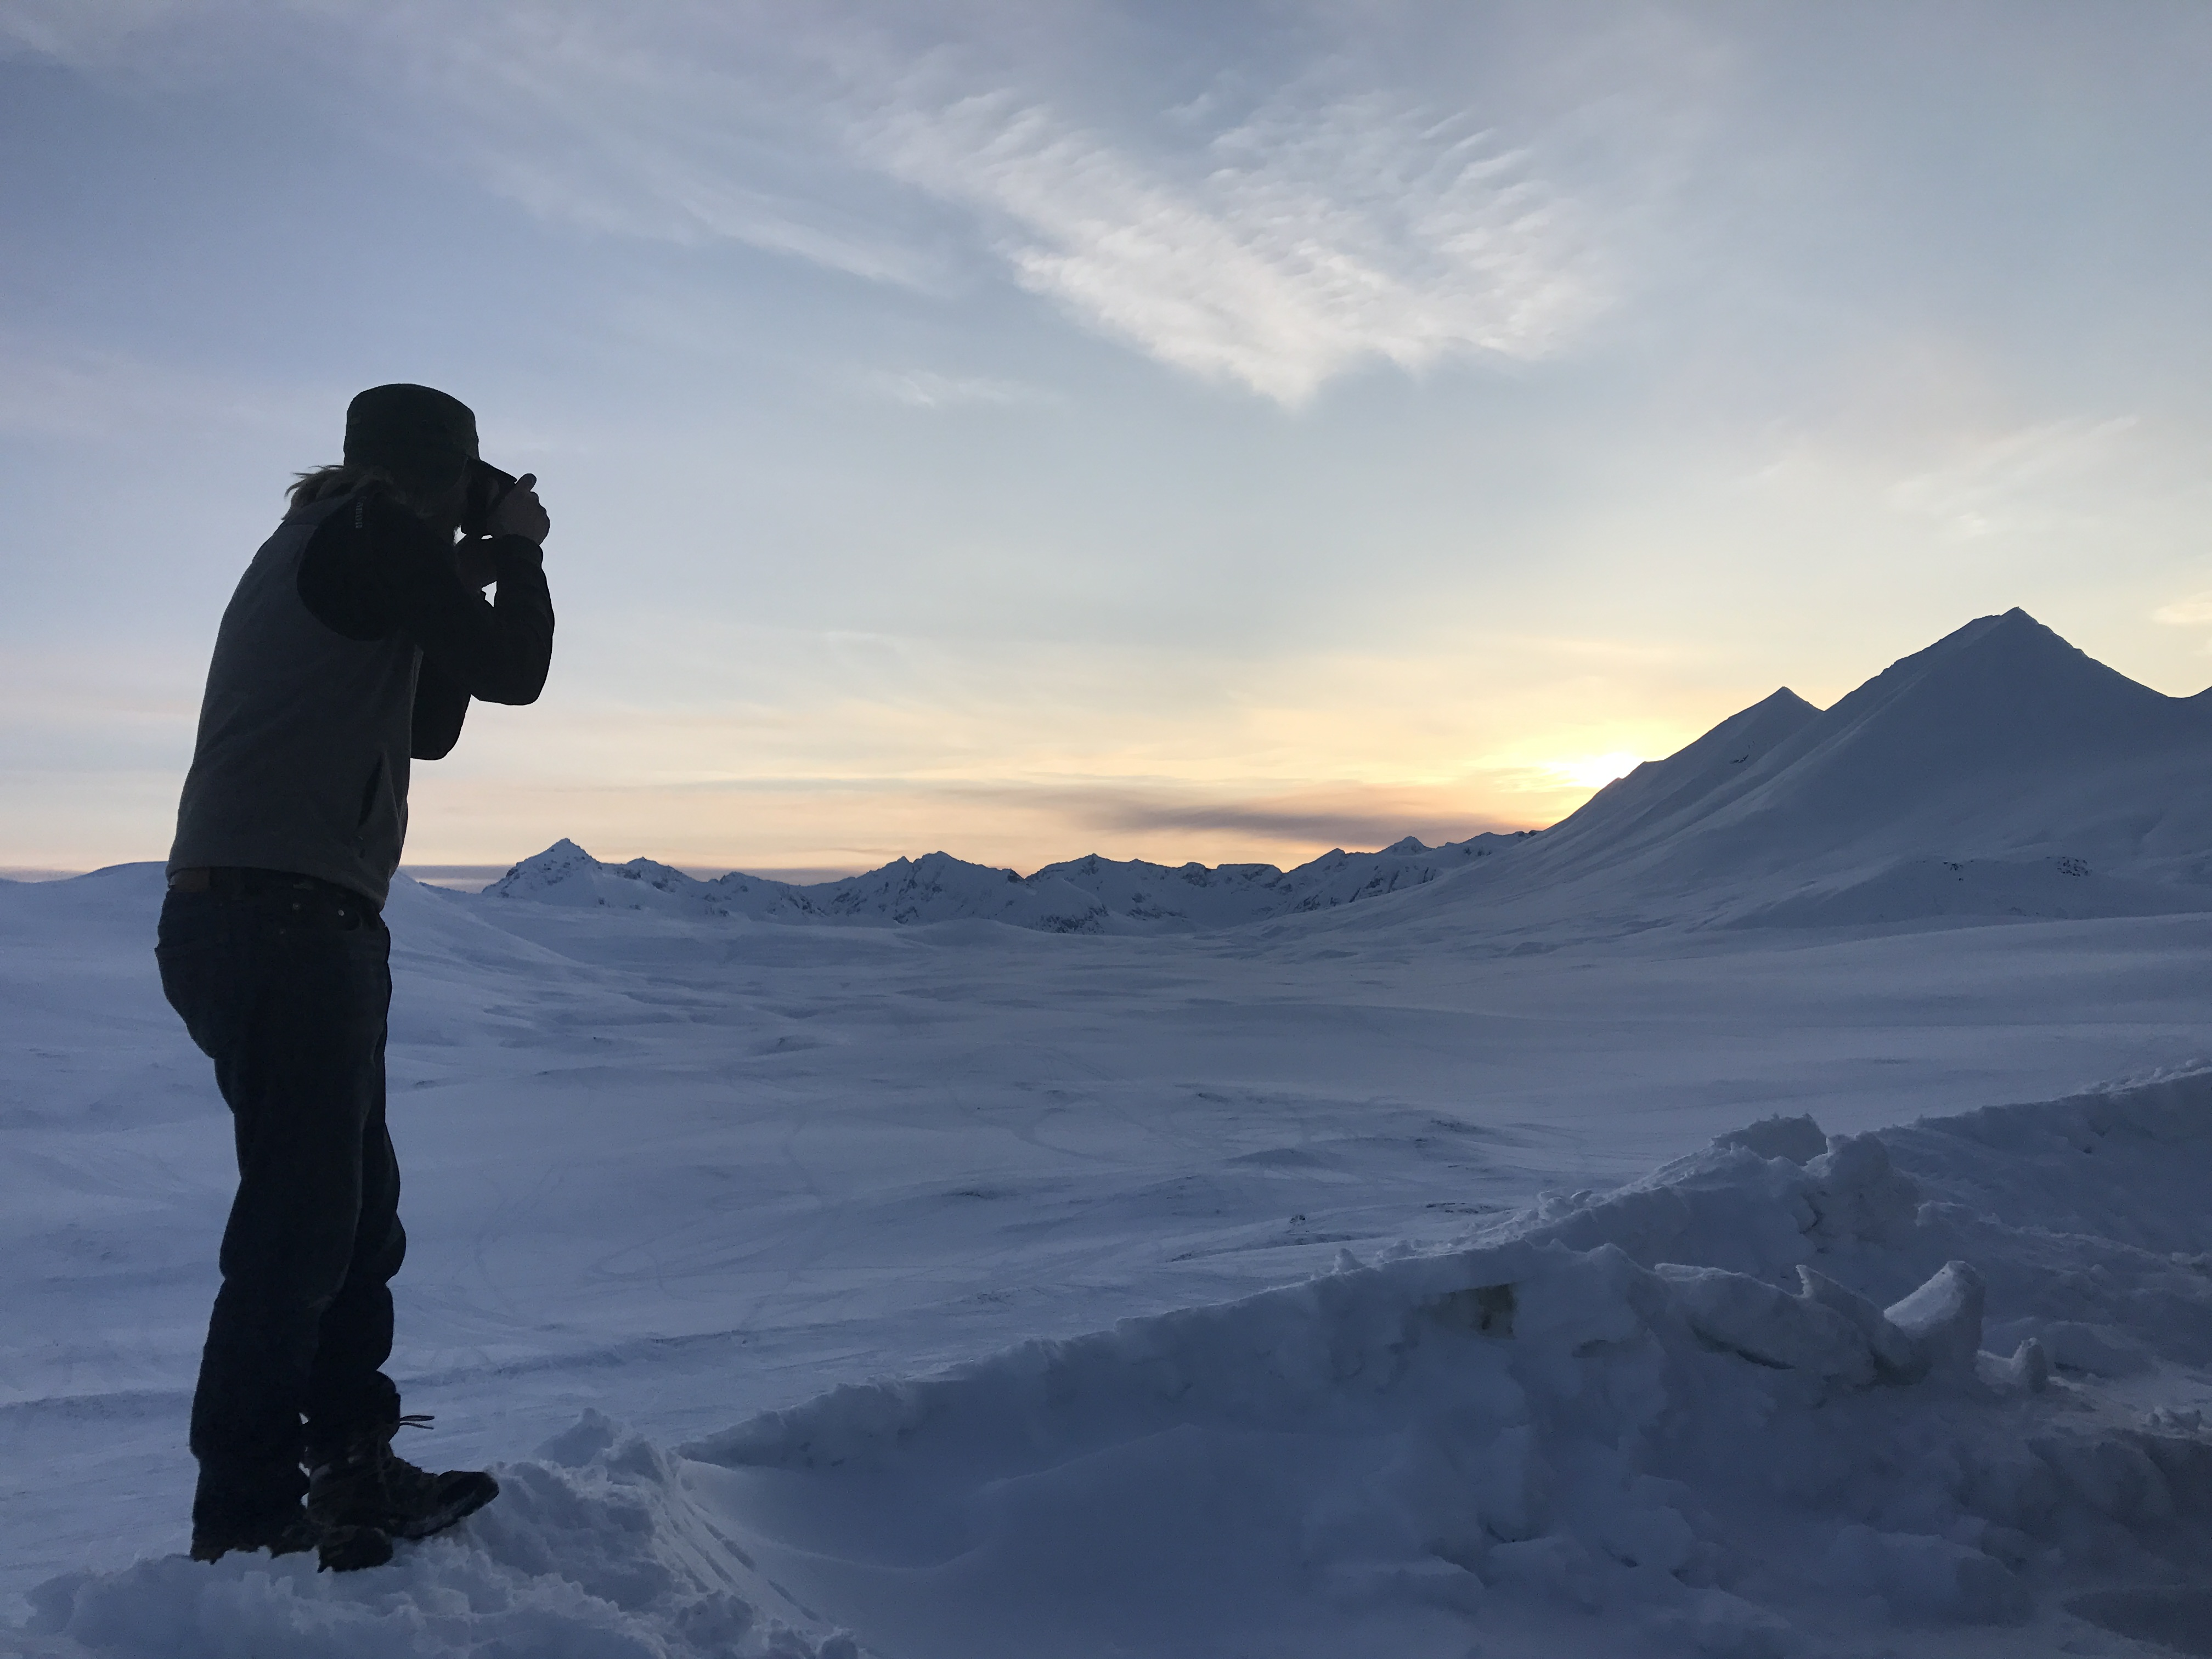 Sam-in-Alaska-Shooting-Kodak-Courage